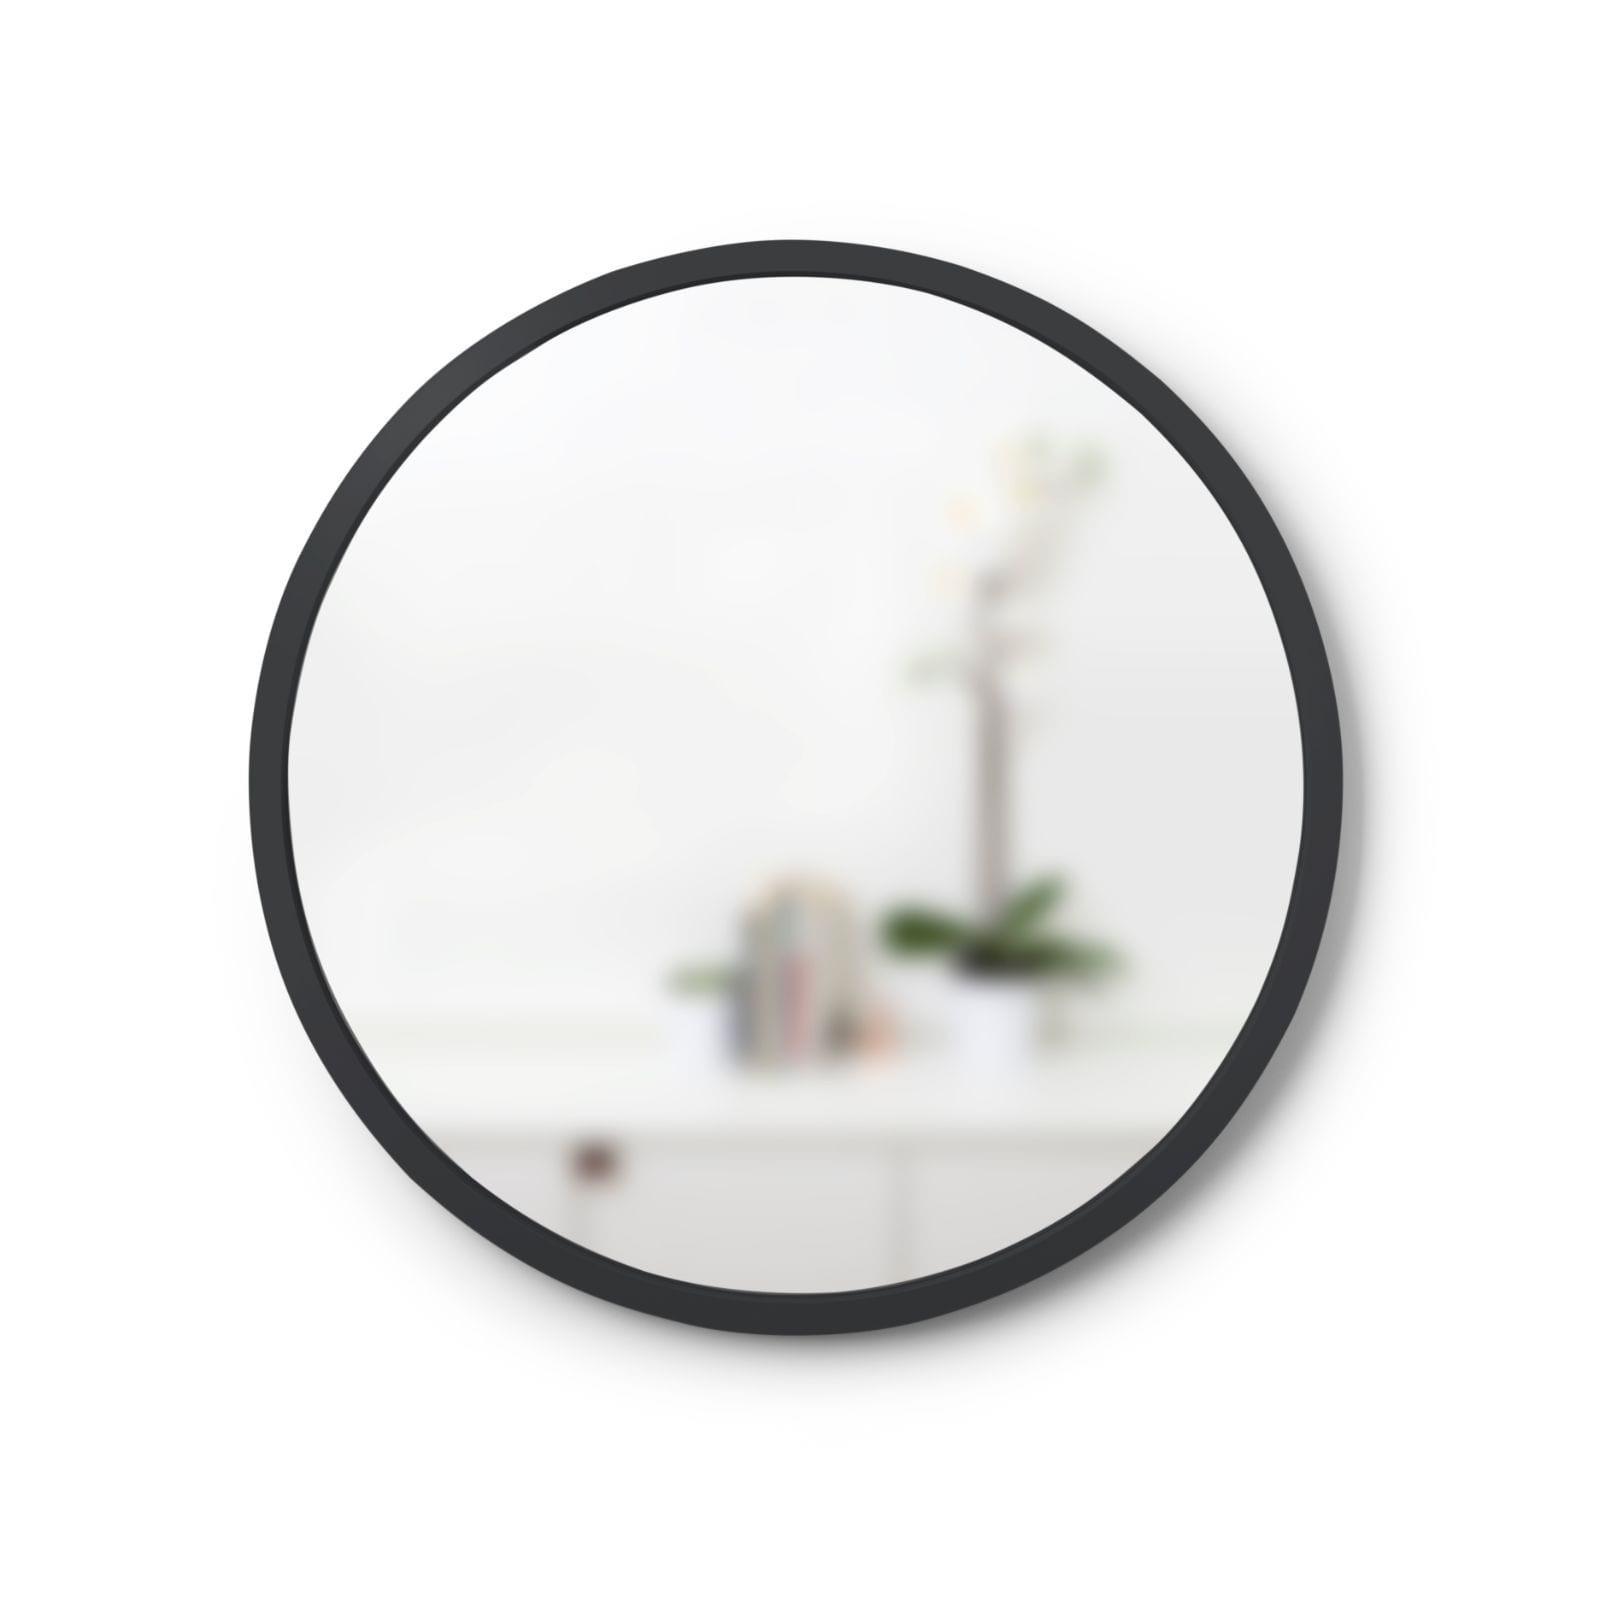 Hub Wall Mirror 18 Inch (Black) - Umbra